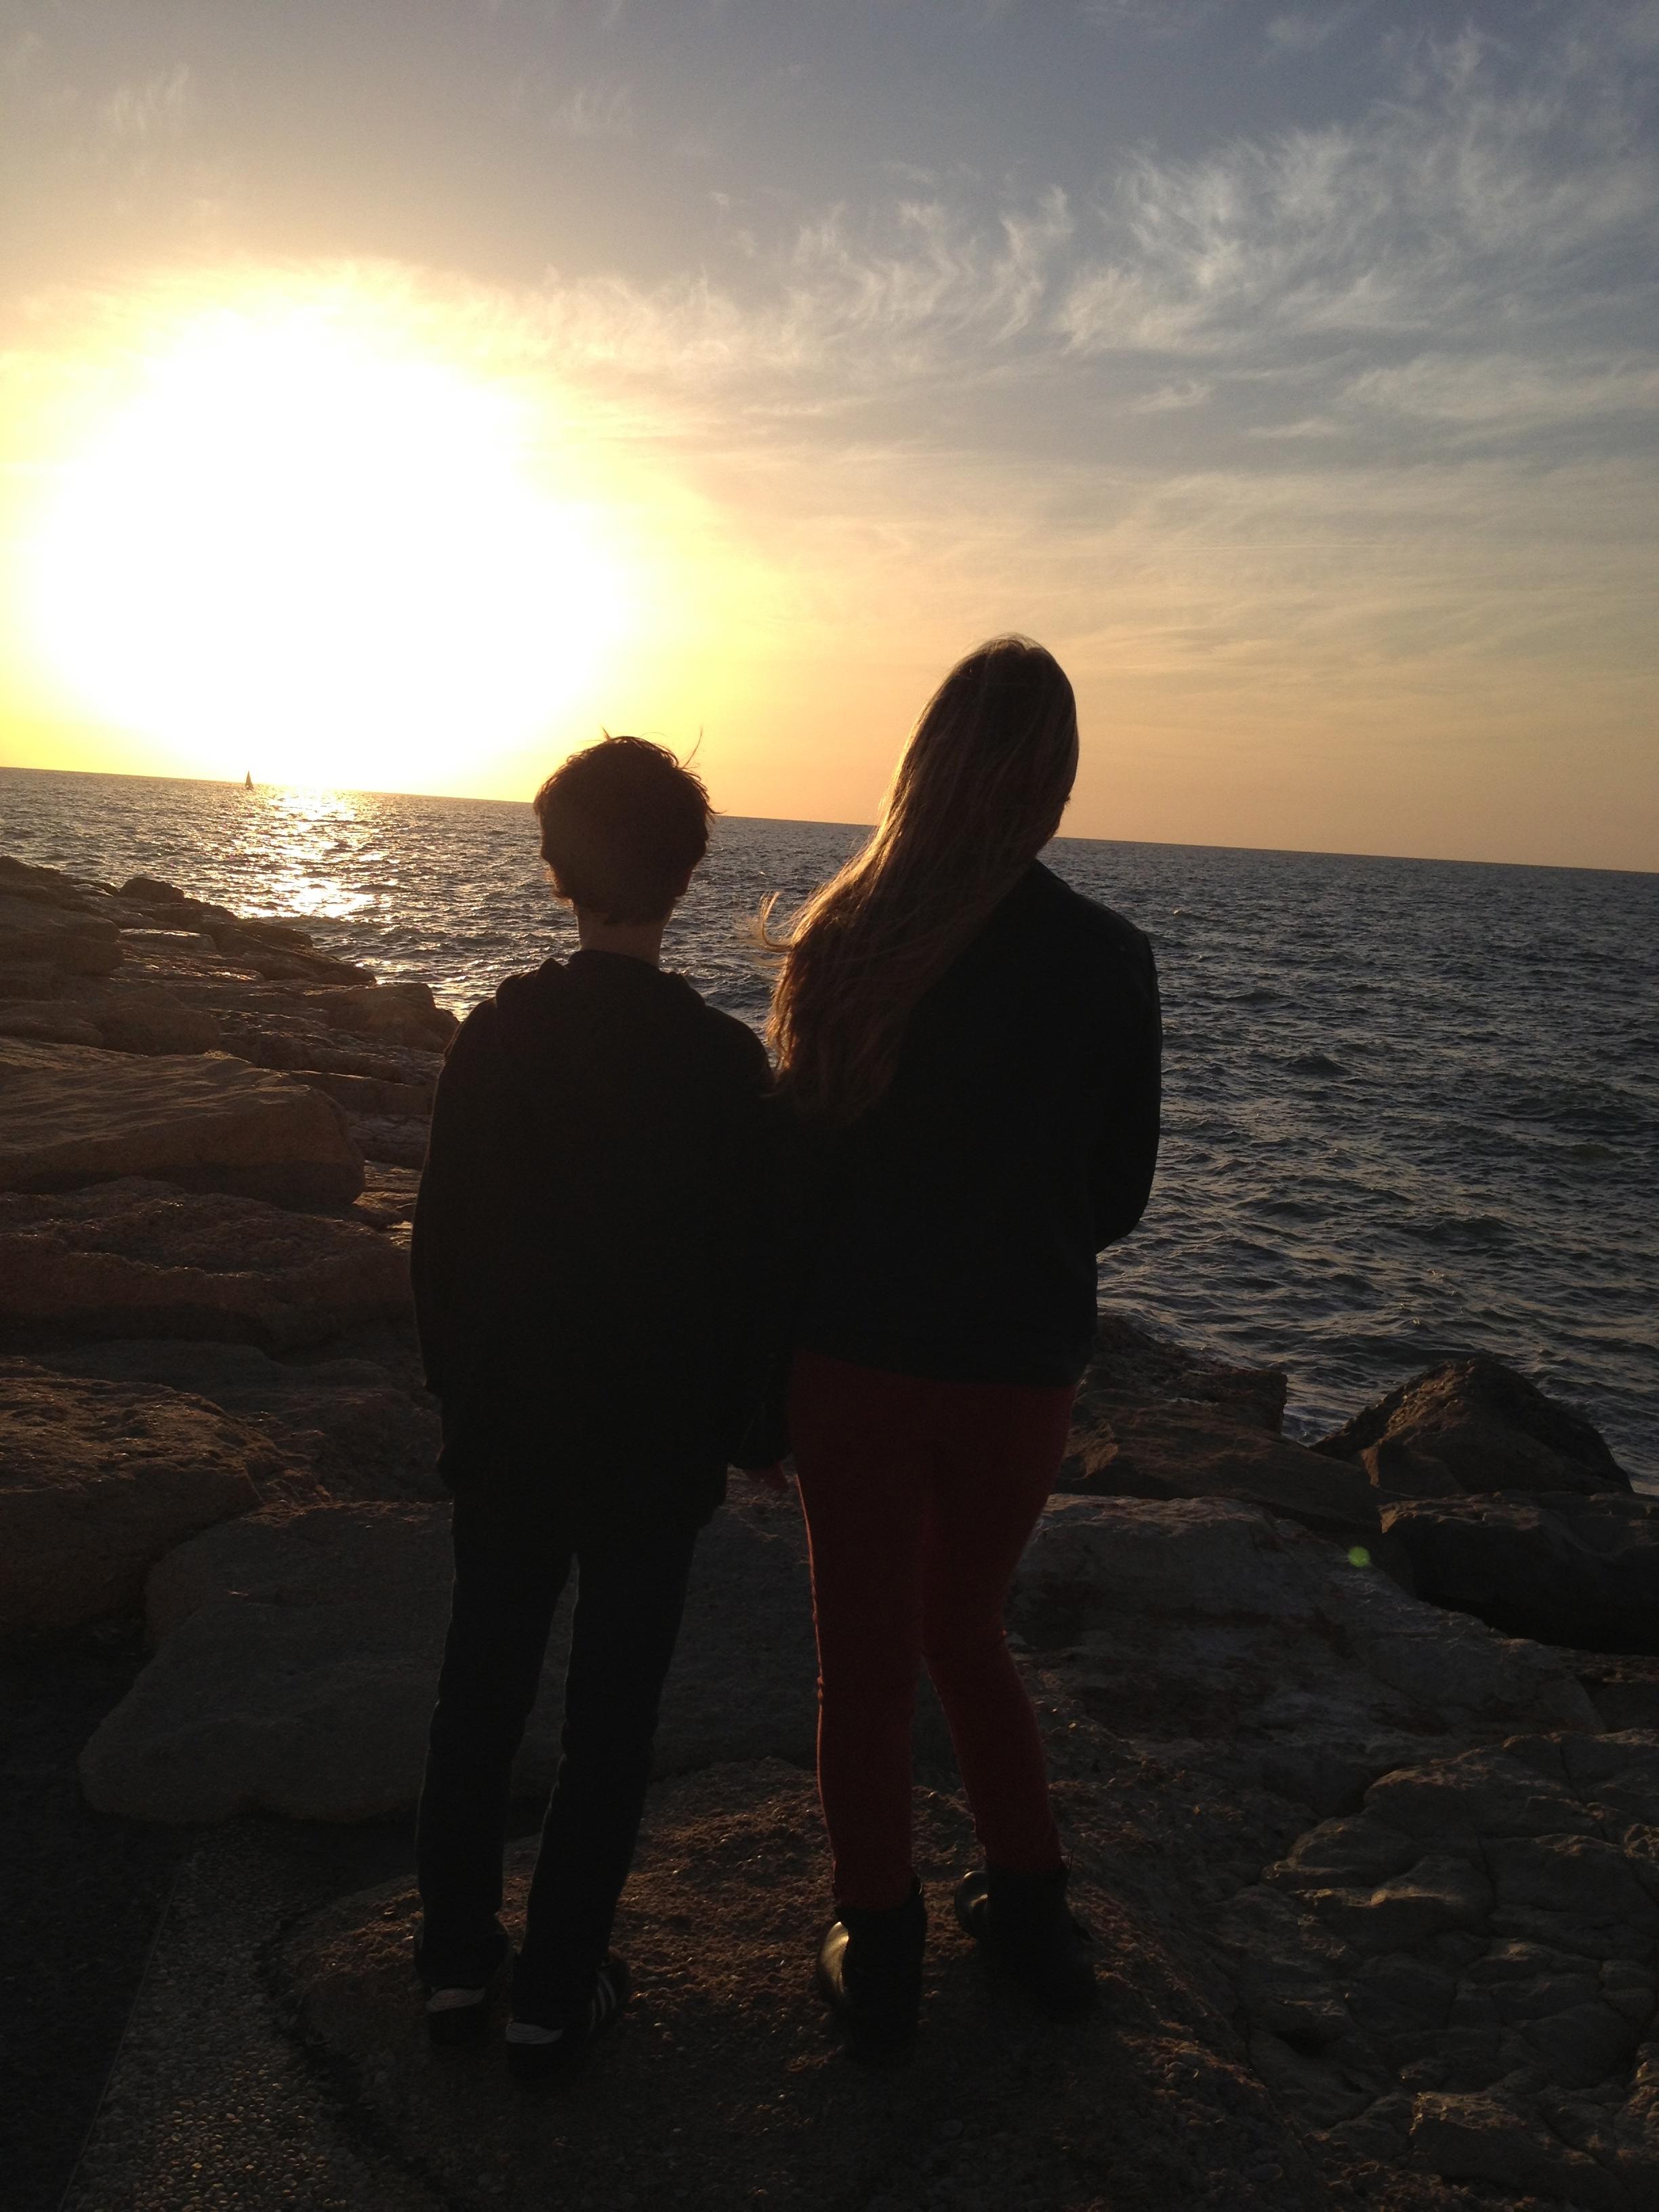 My children Alex and Rachel on the beach enjoying the sunset in Tel Aviv, Israel.